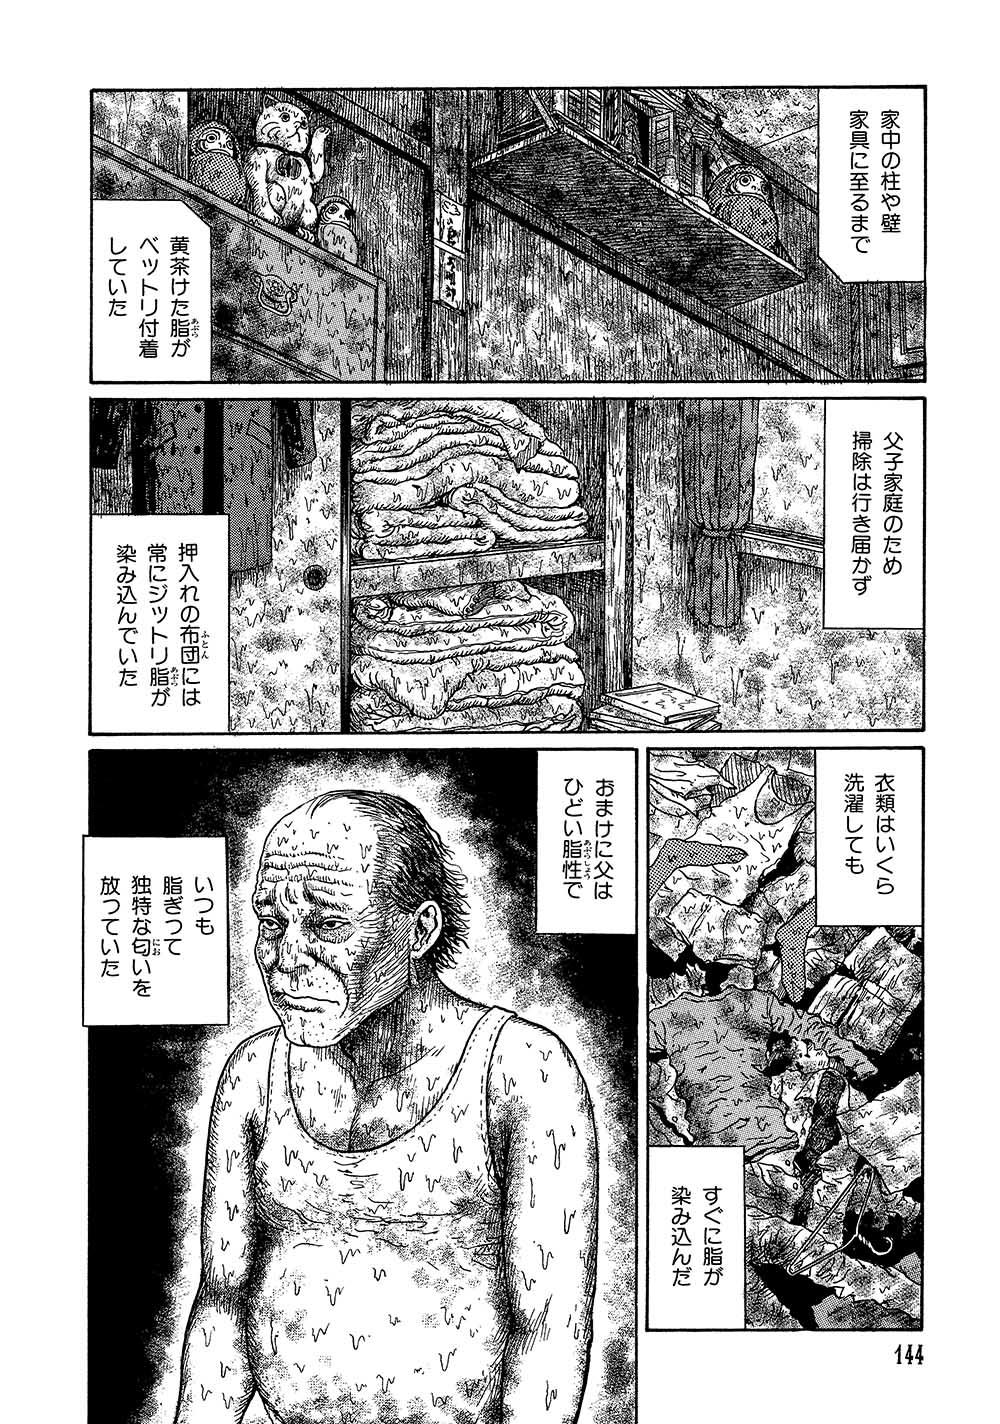 yami_0001_0144.jpg